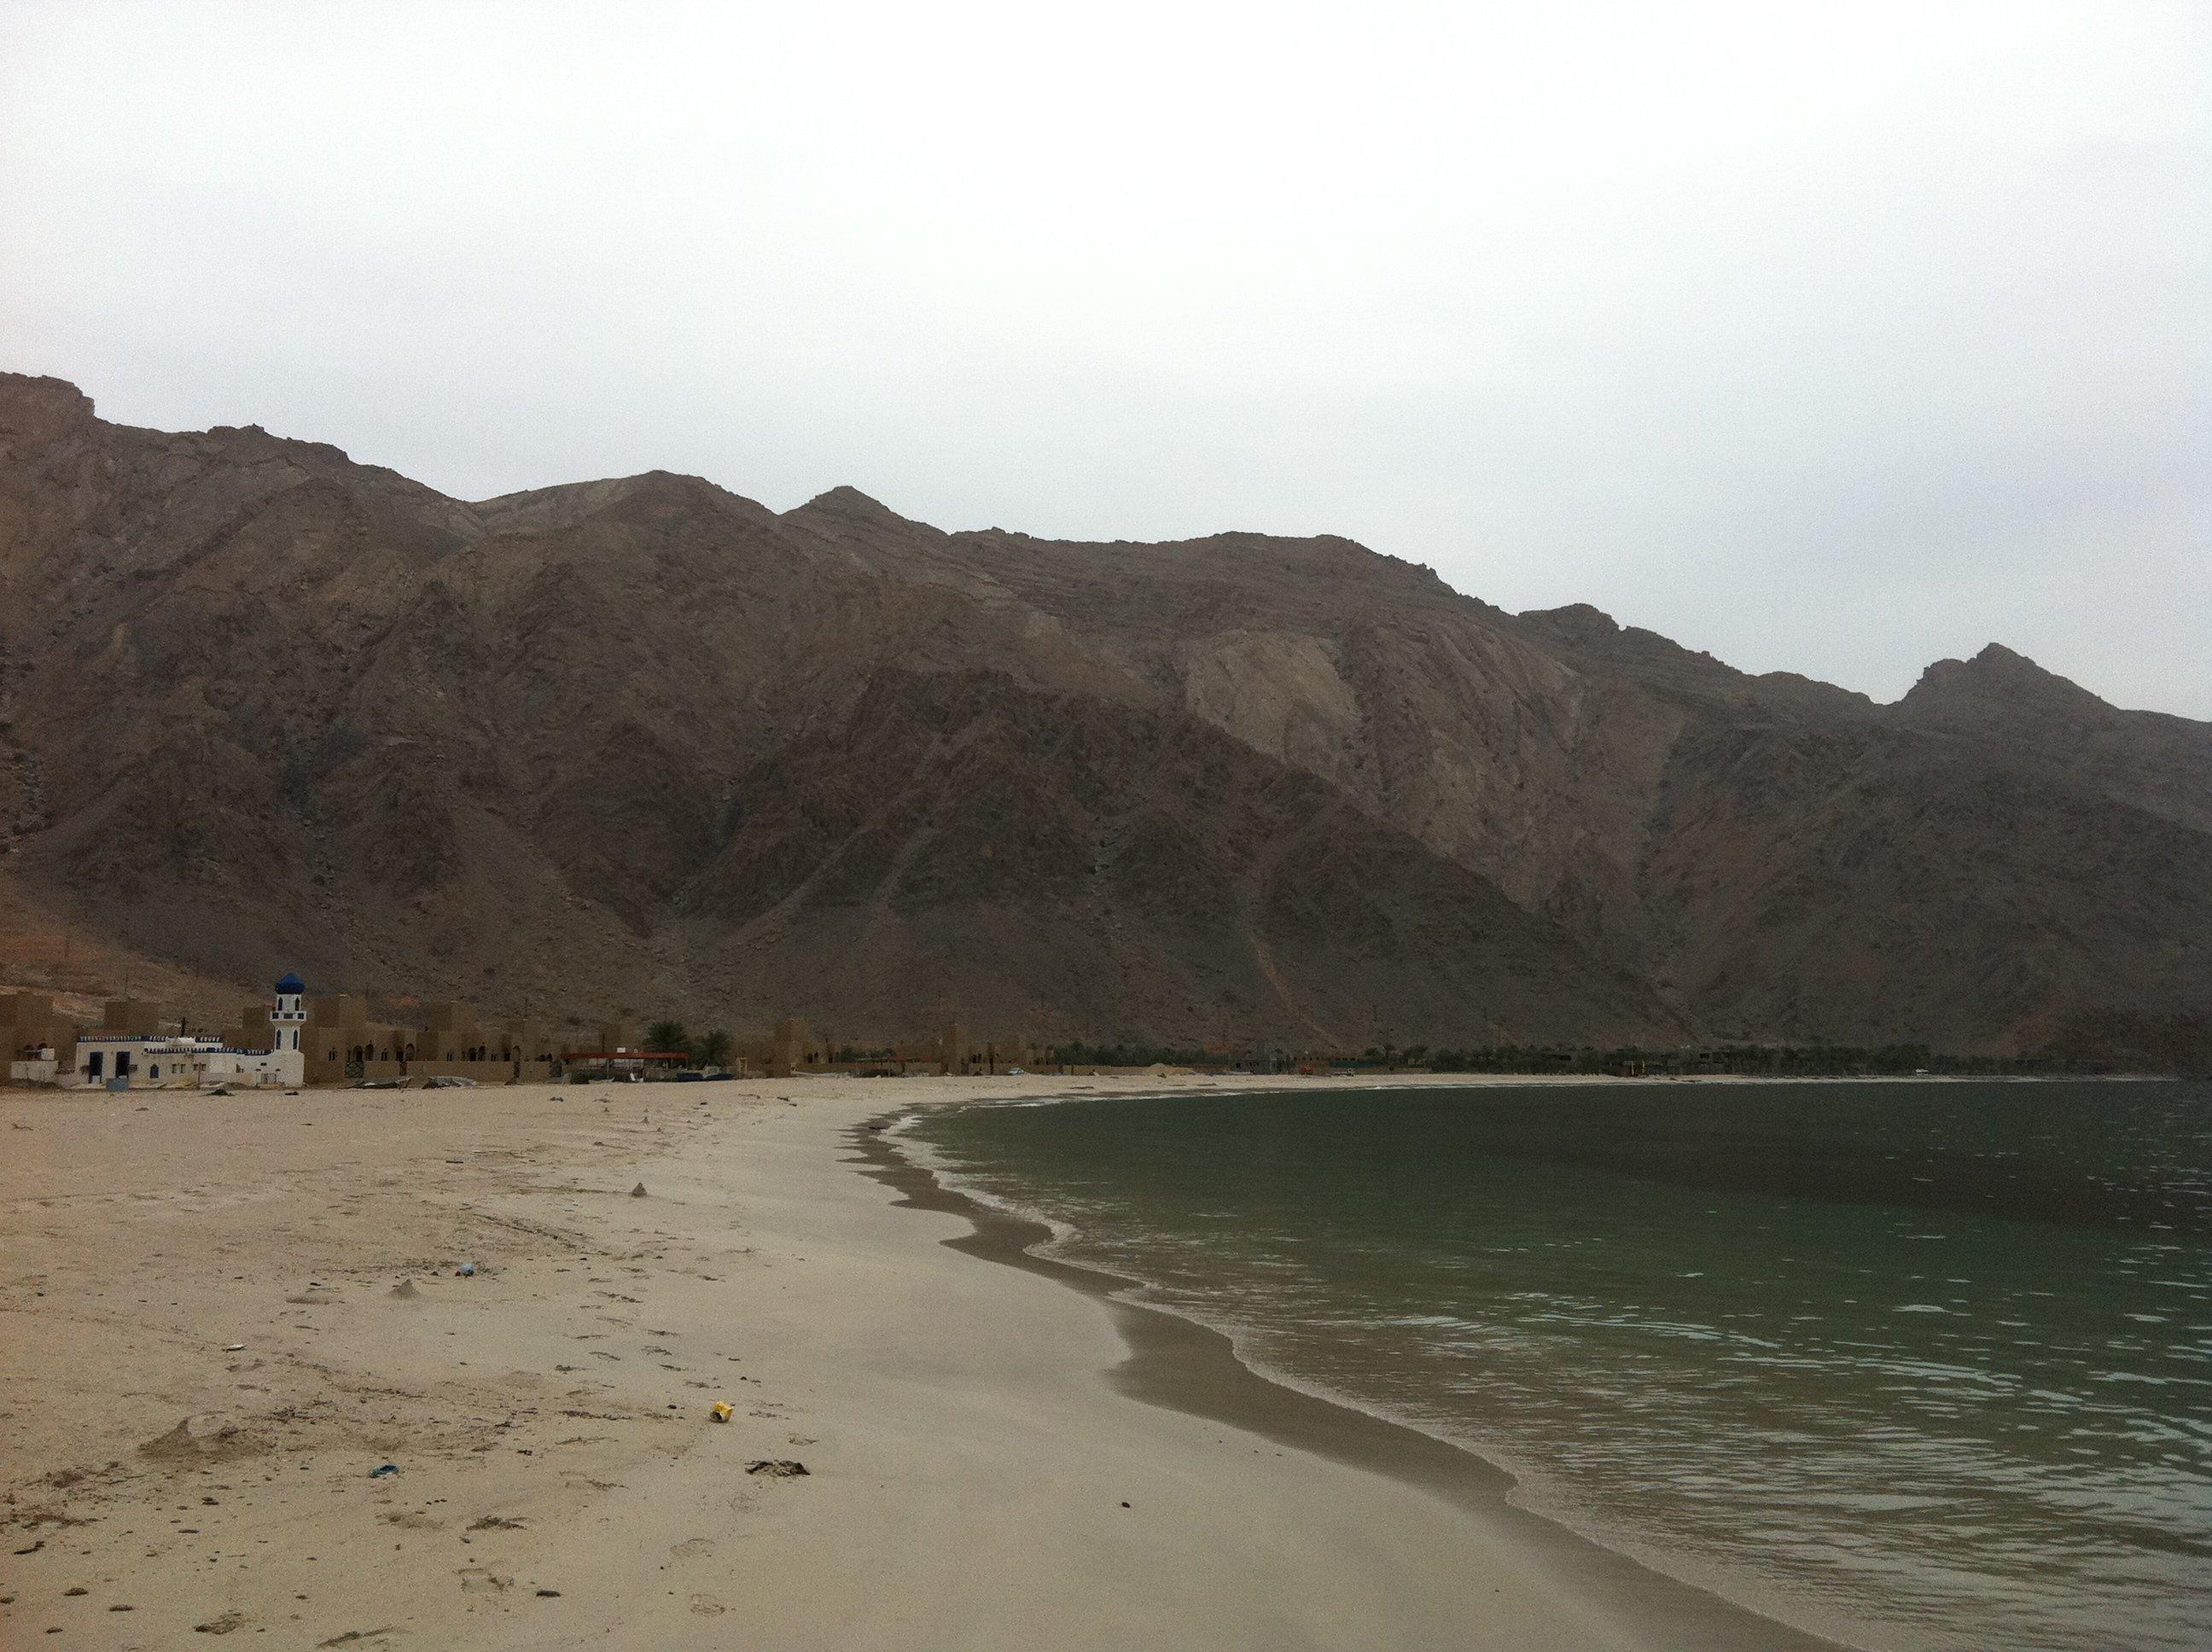 Guida all'Oman, paese arabo sui generis